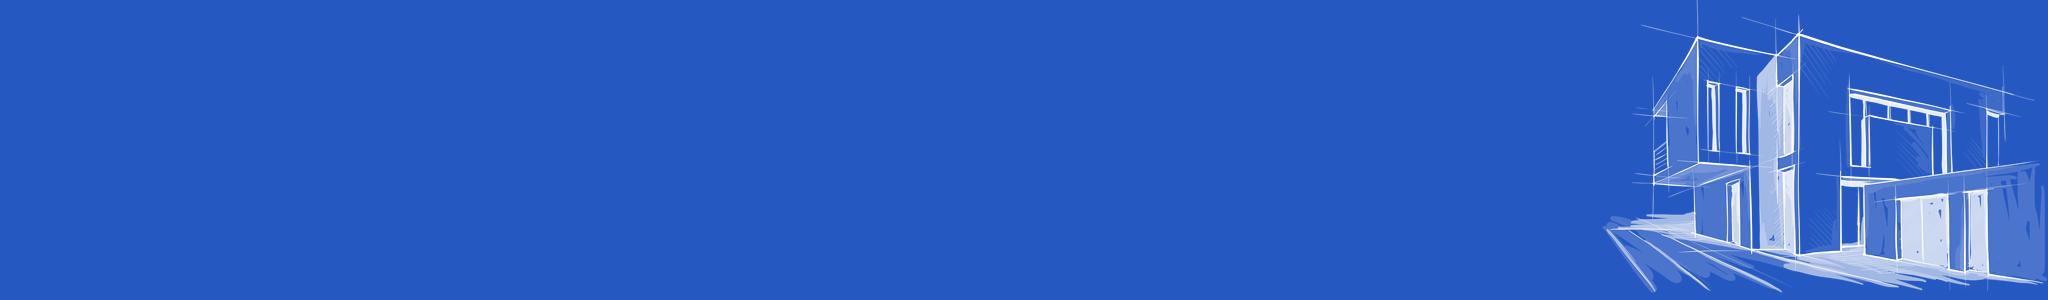 Agenzia Immobiliare Blu Carpi - Vendita Immobili